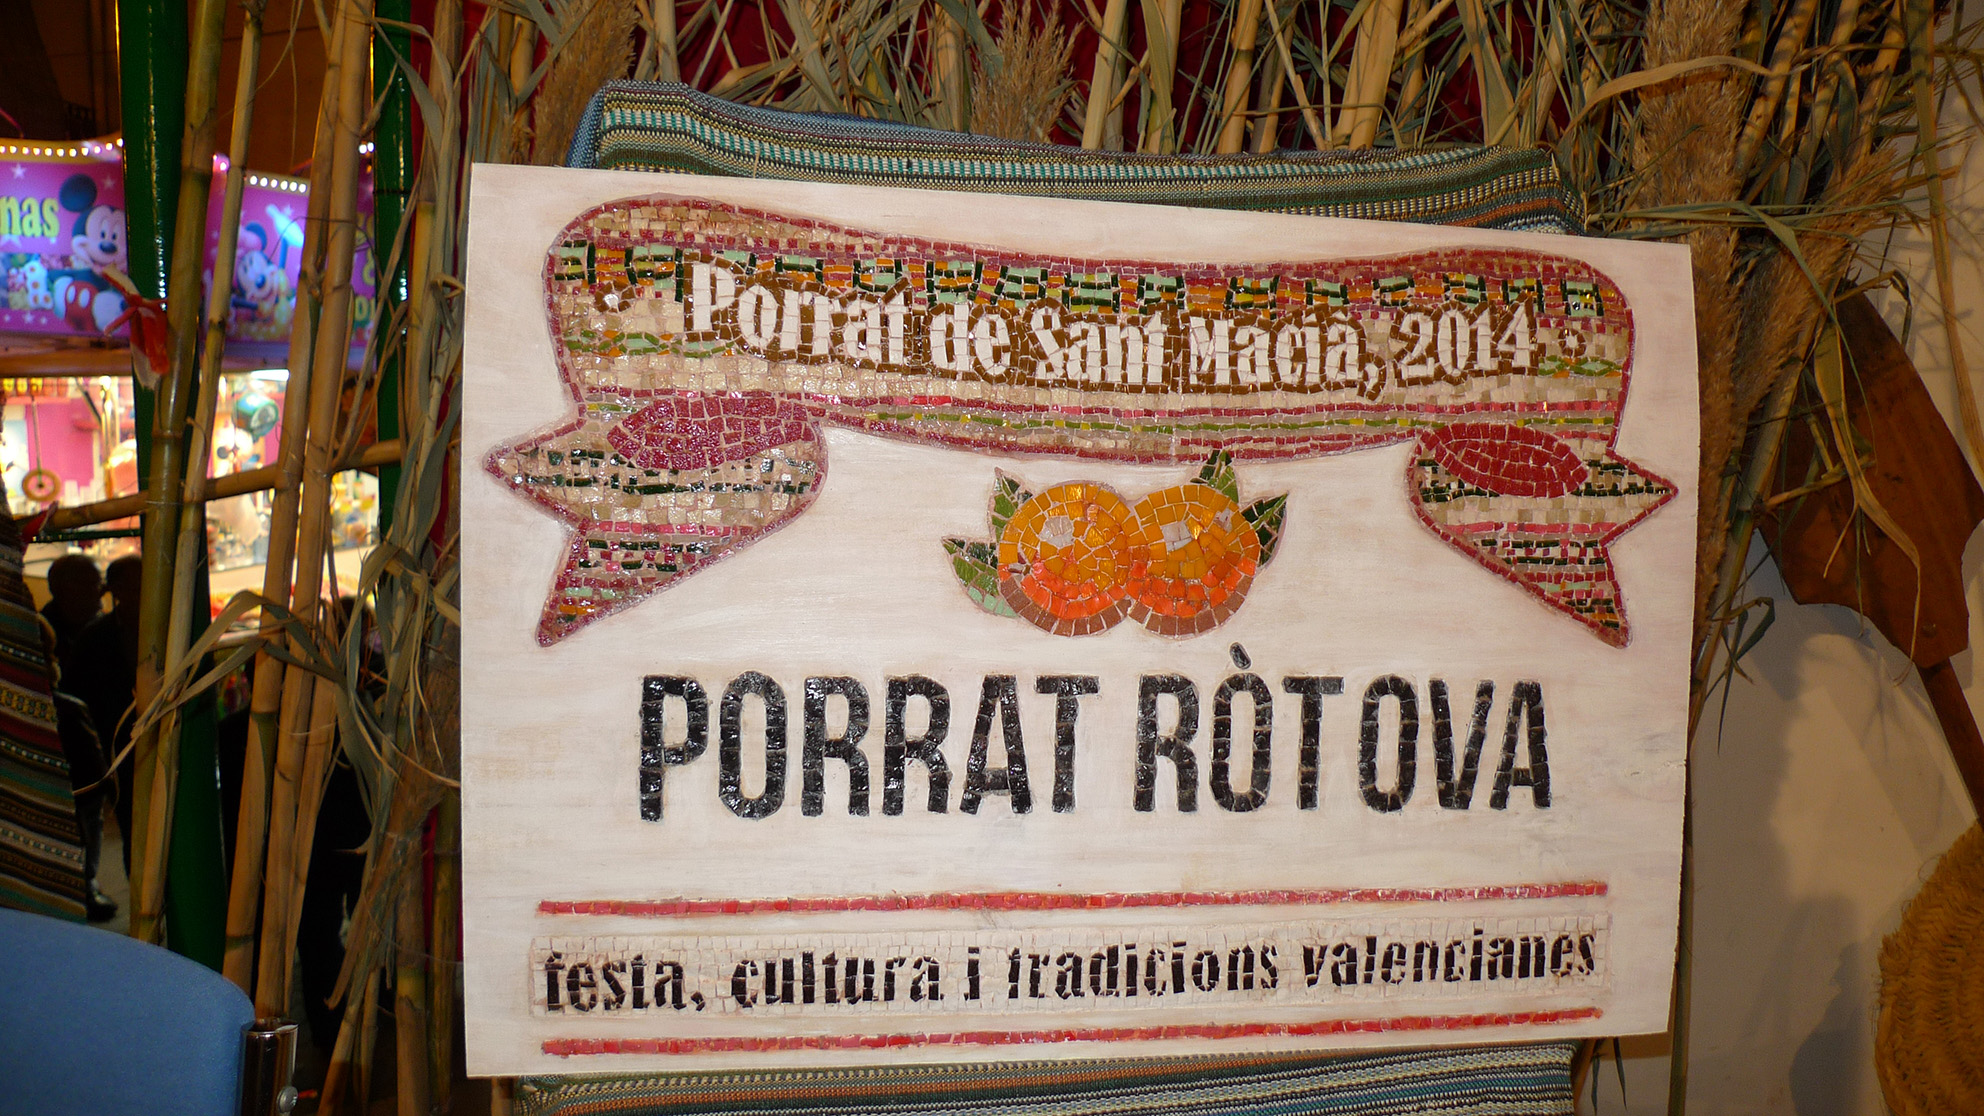 2014-02-23 - Baladre a Fira St. Marcia-ROTOVA (218)